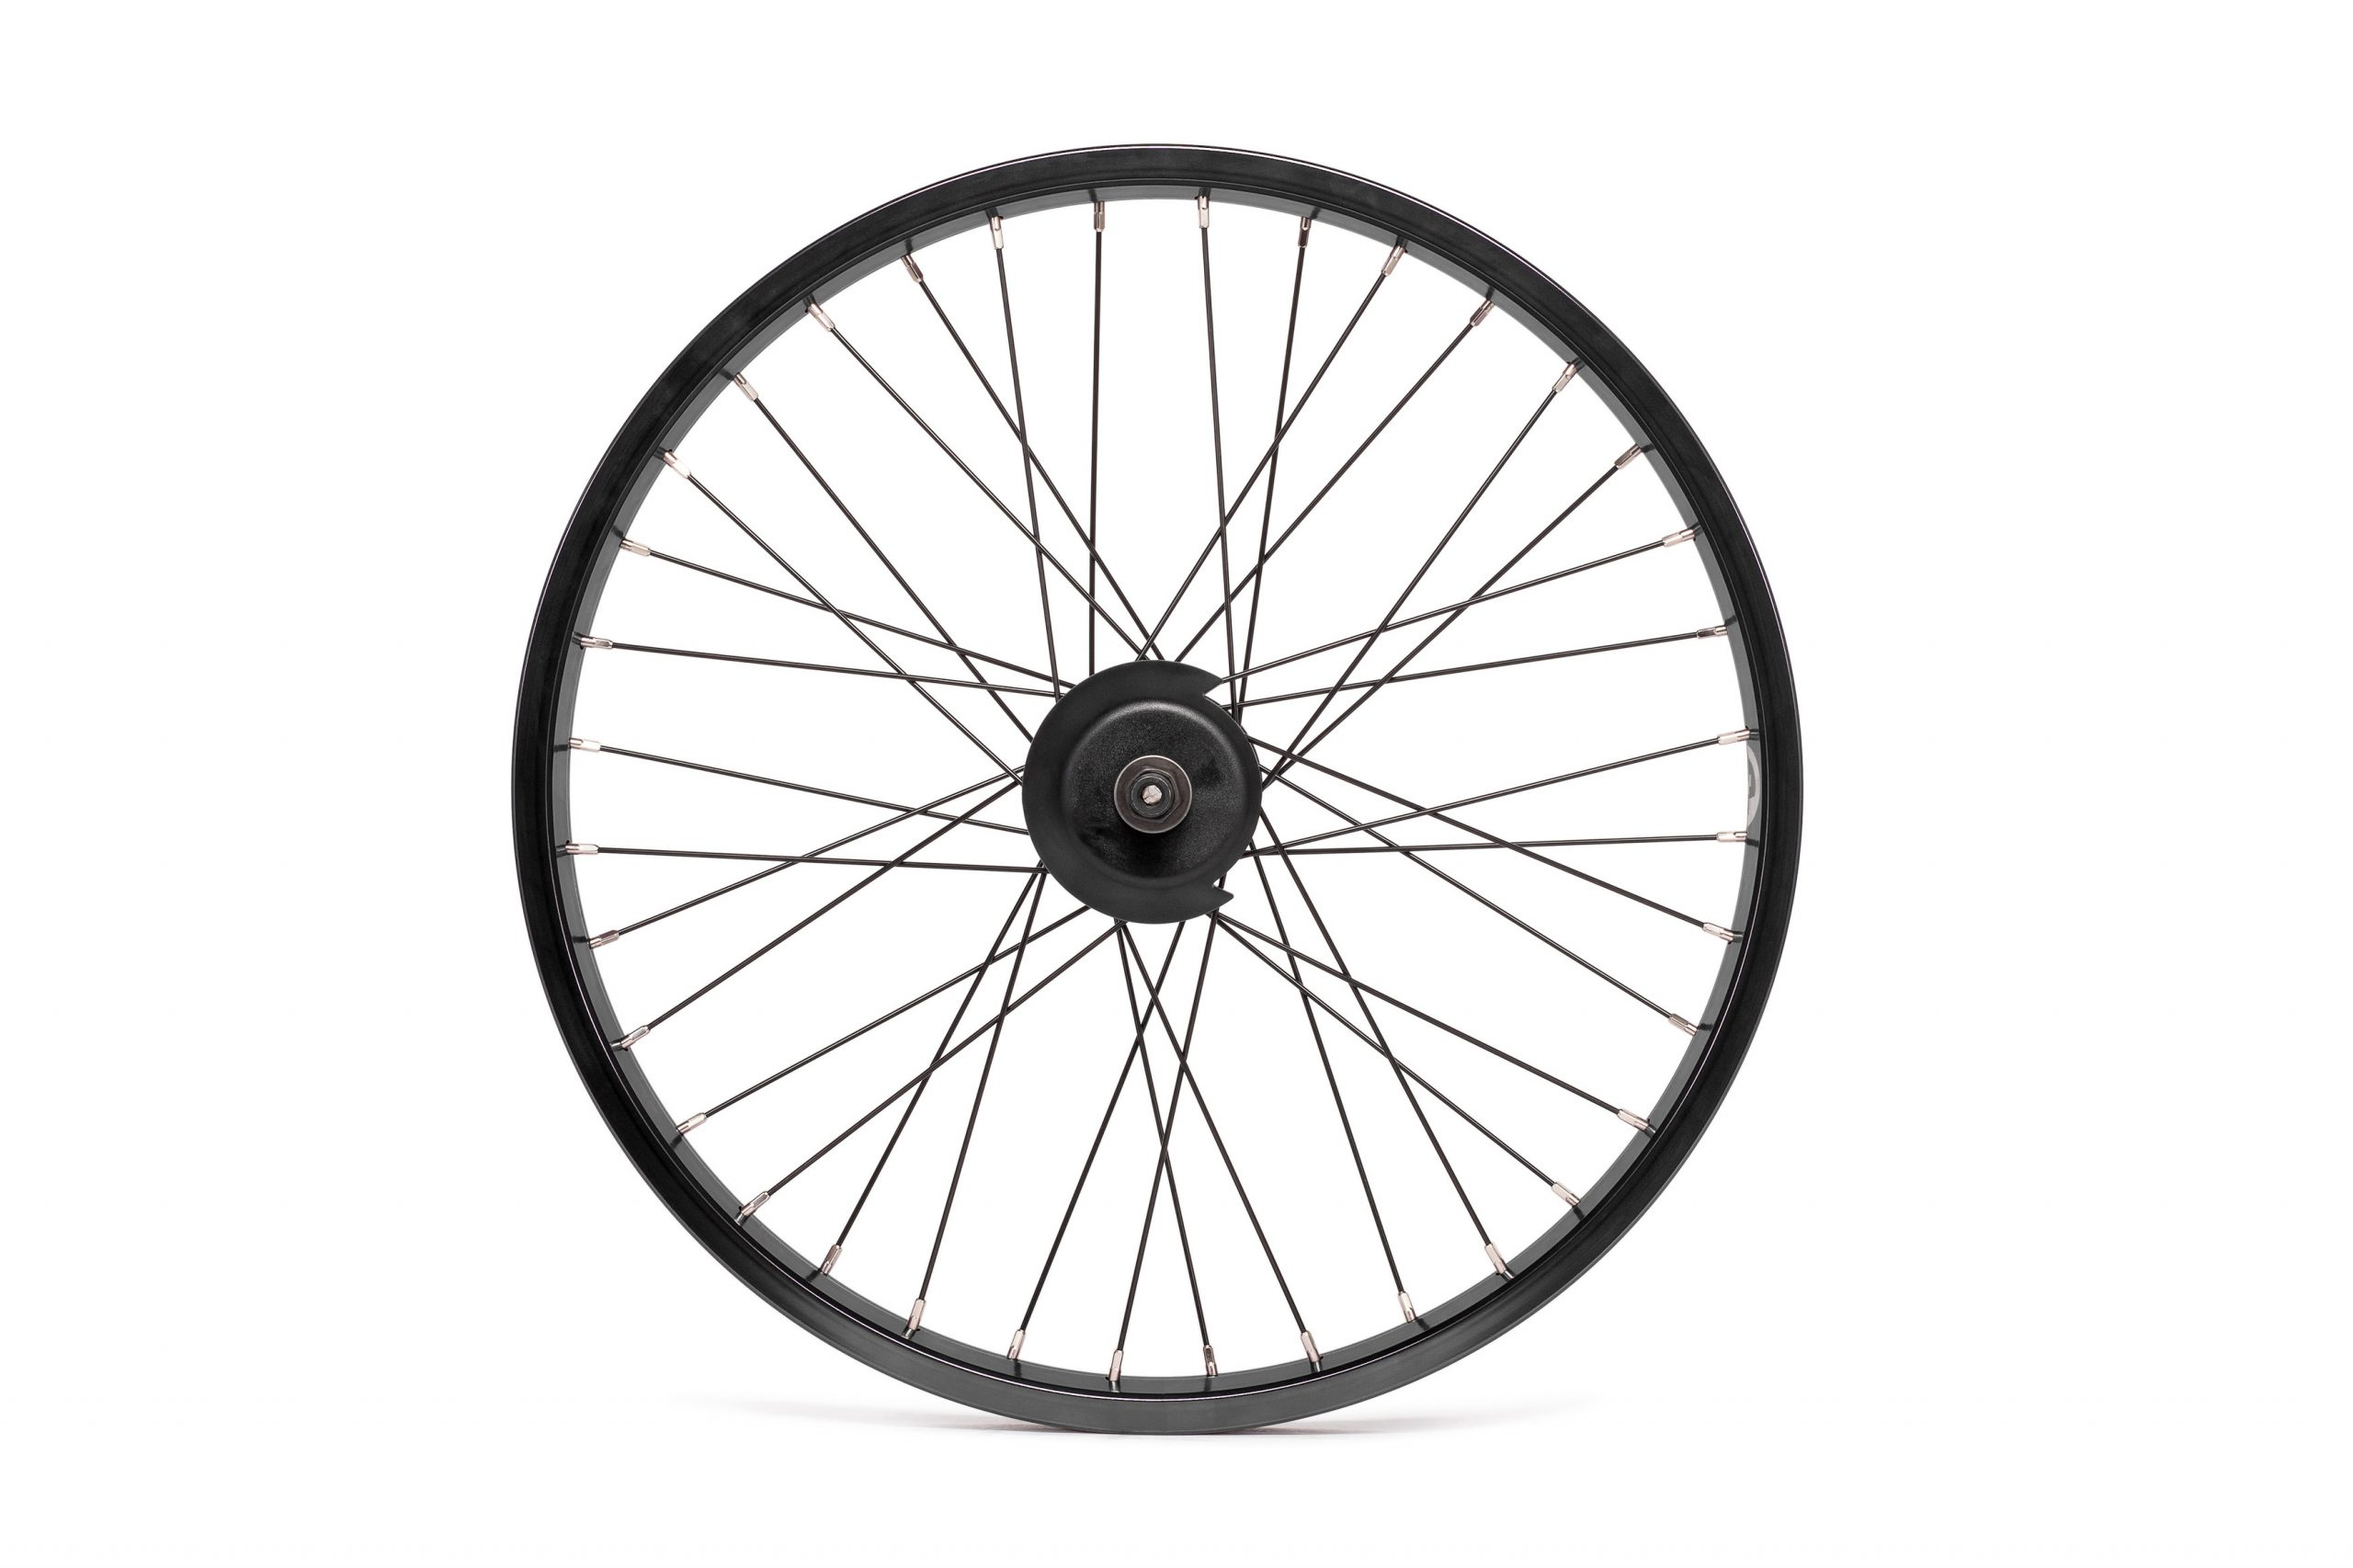 Salt_Everest_FC_rear_wheel_black_01